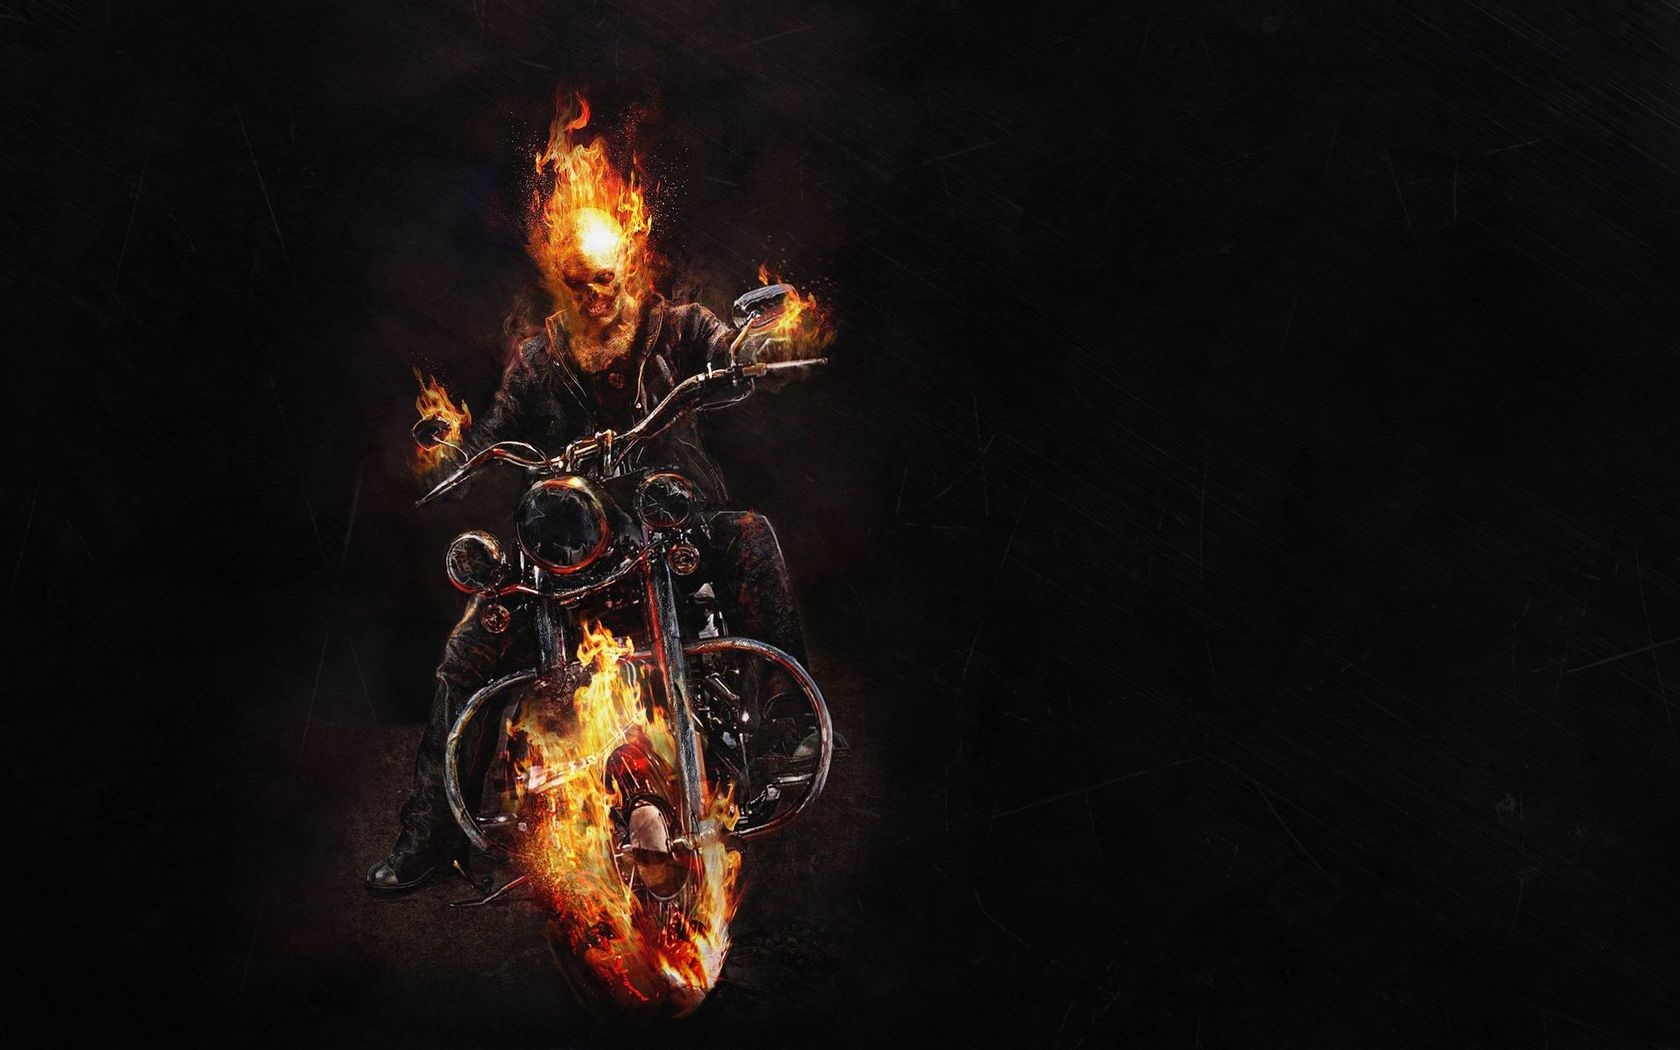 Ghost Rider wallpaper 19661 1680x1050